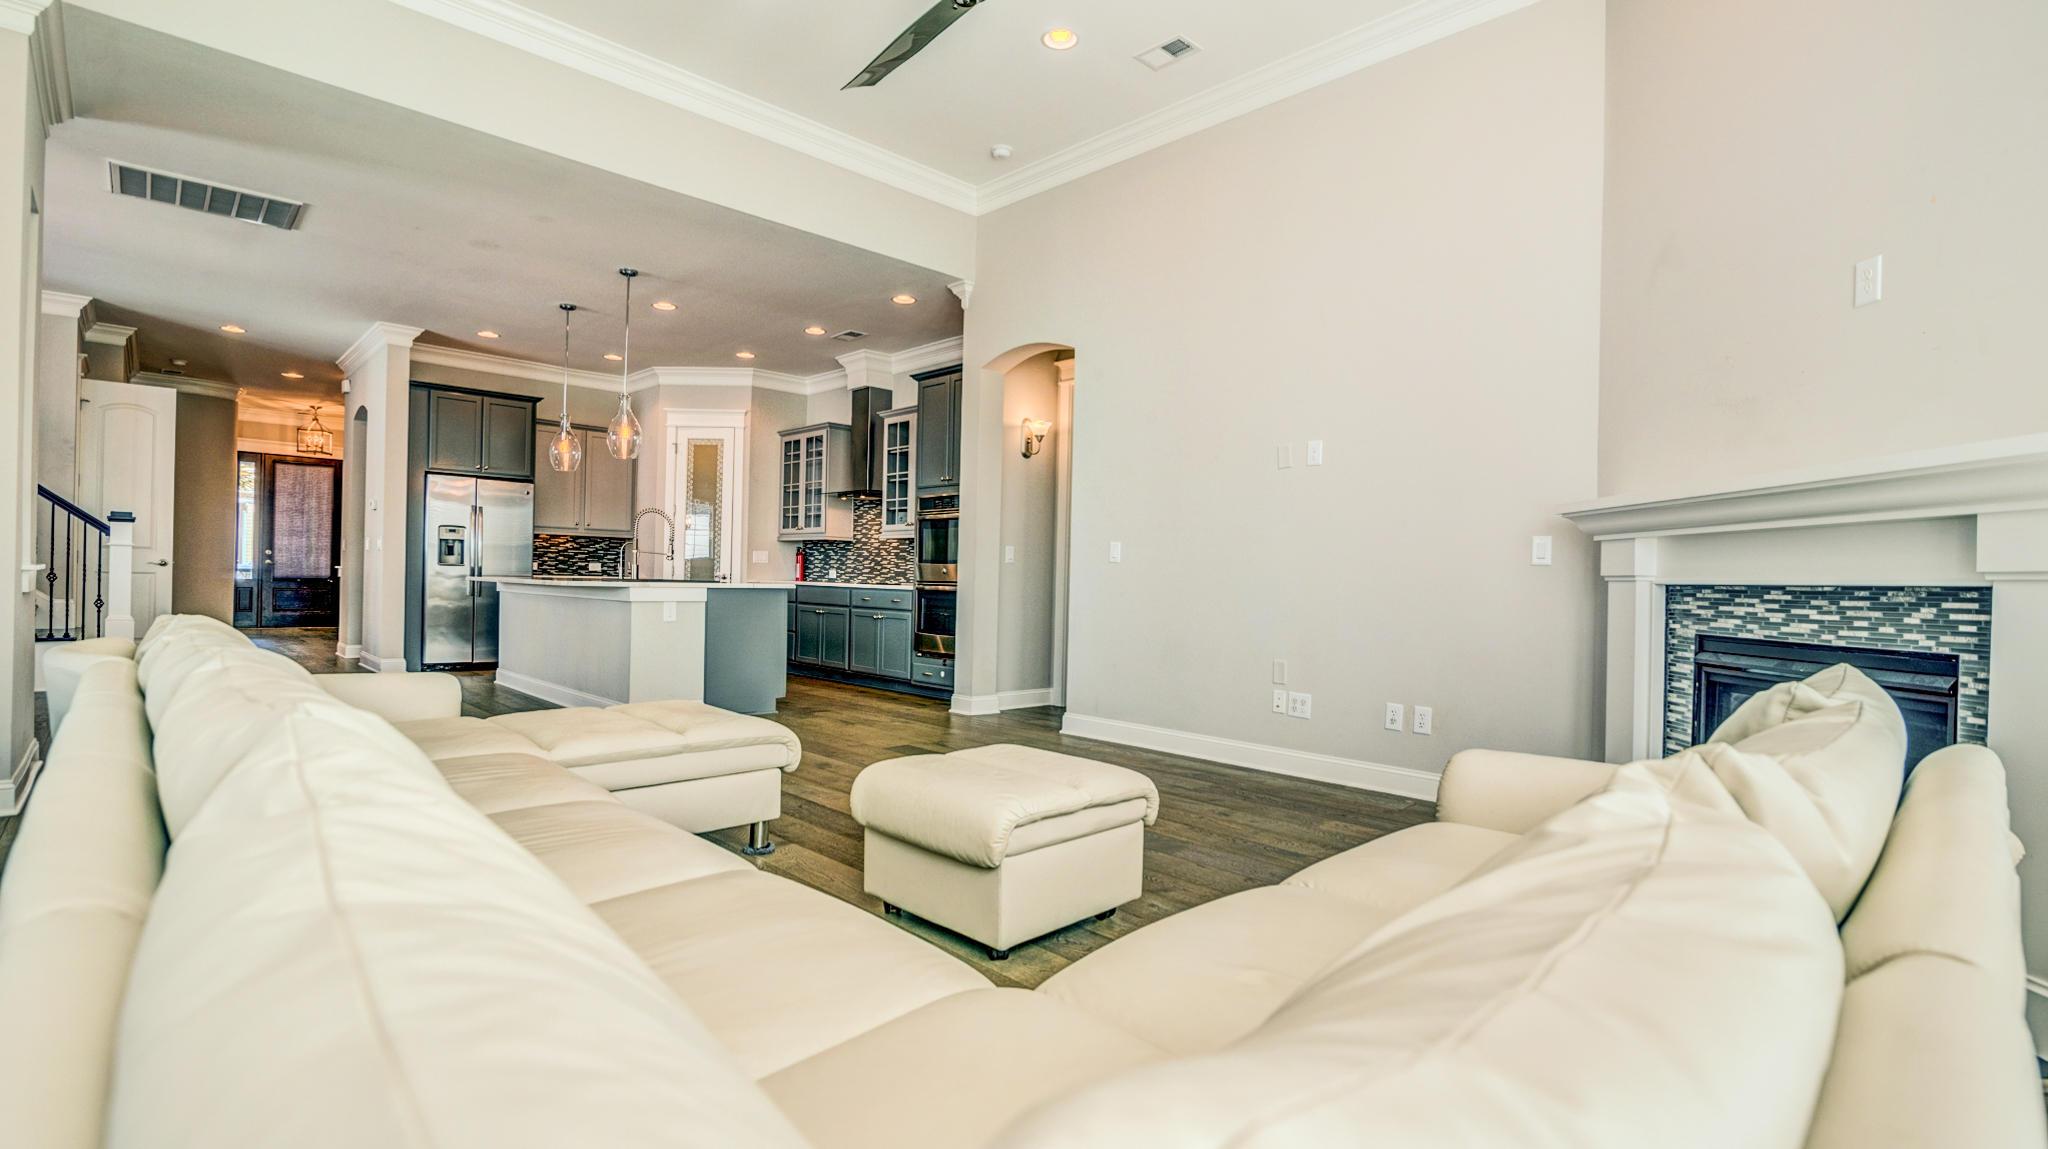 Carolina Park Homes For Sale - 3687 Spindrift, Mount Pleasant, SC - 0